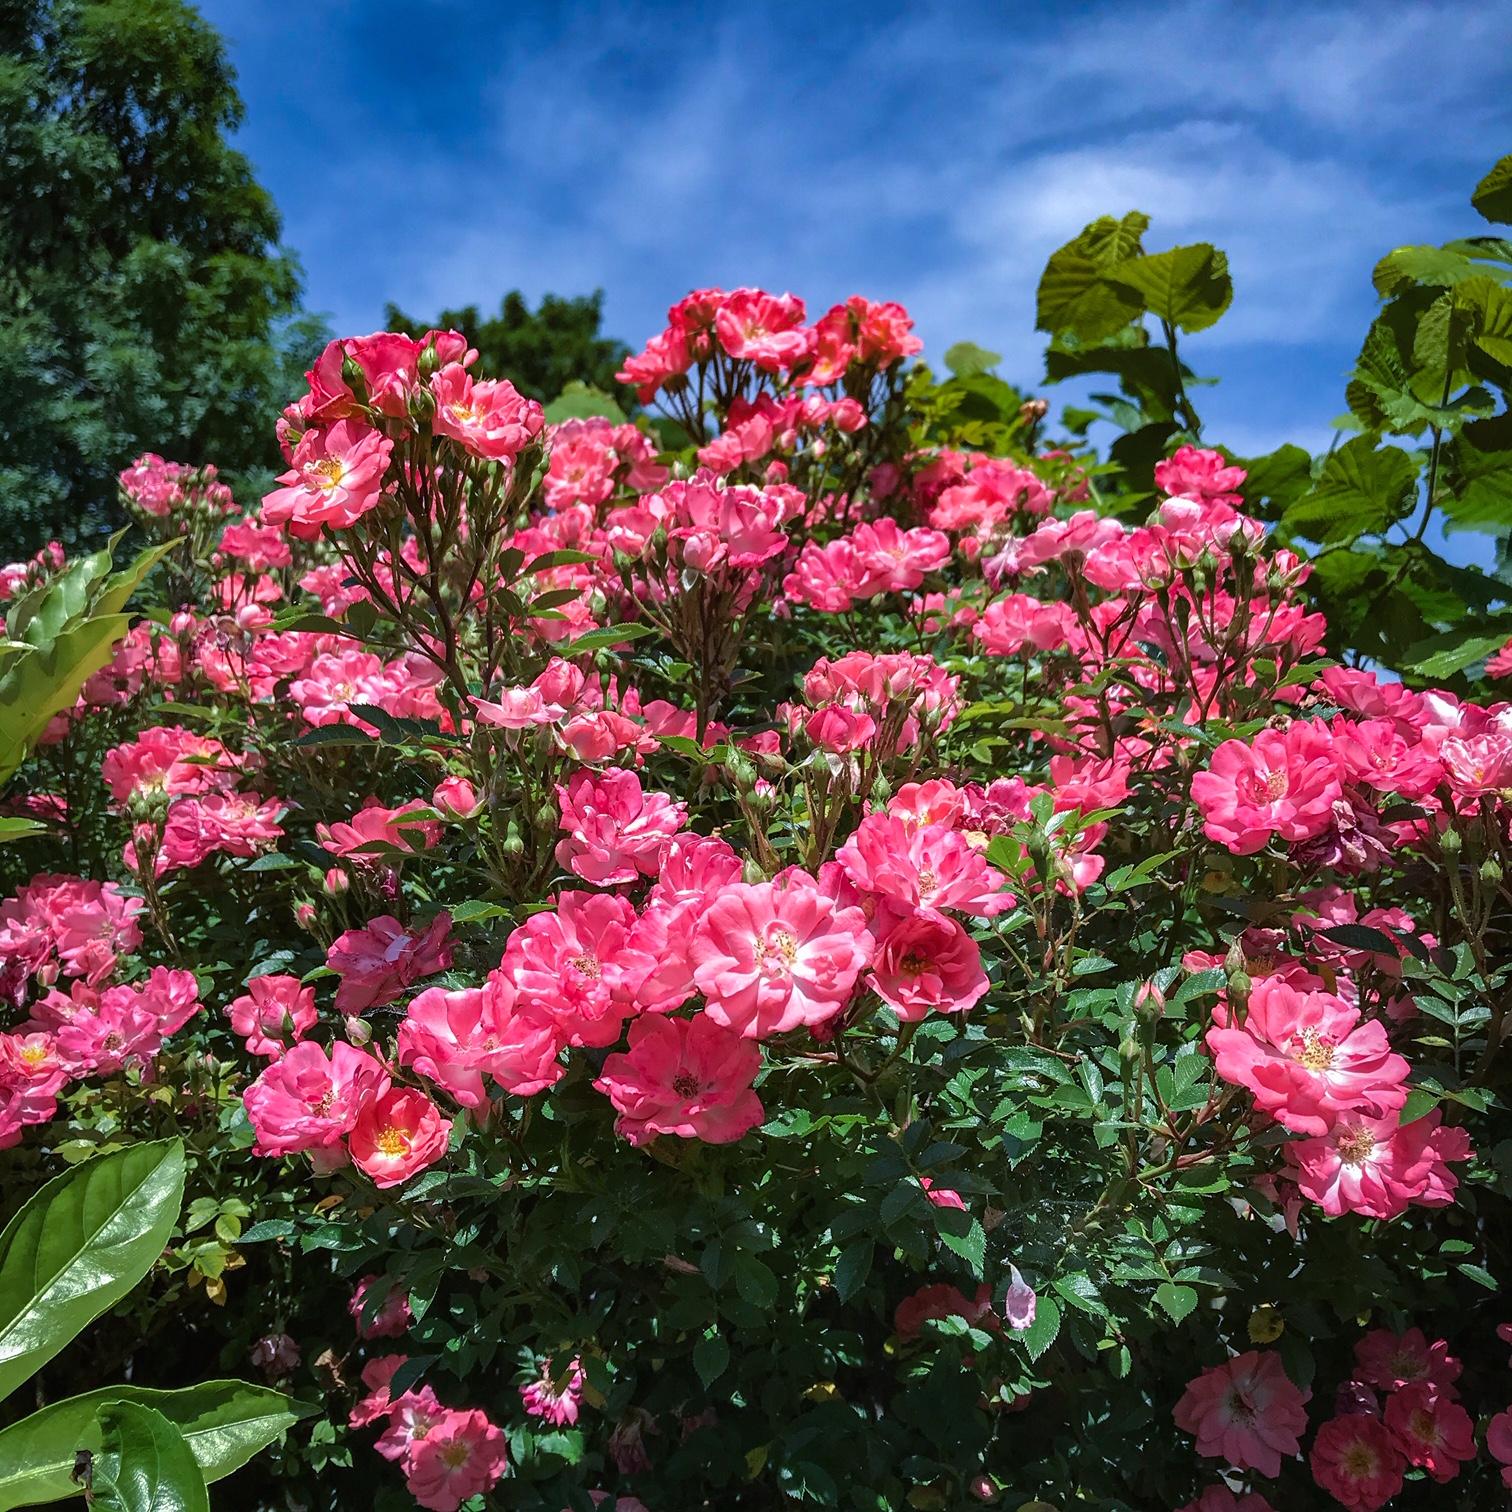 Beyond Bloom Garden Maintenance - Climbing Rose - Streatham - London